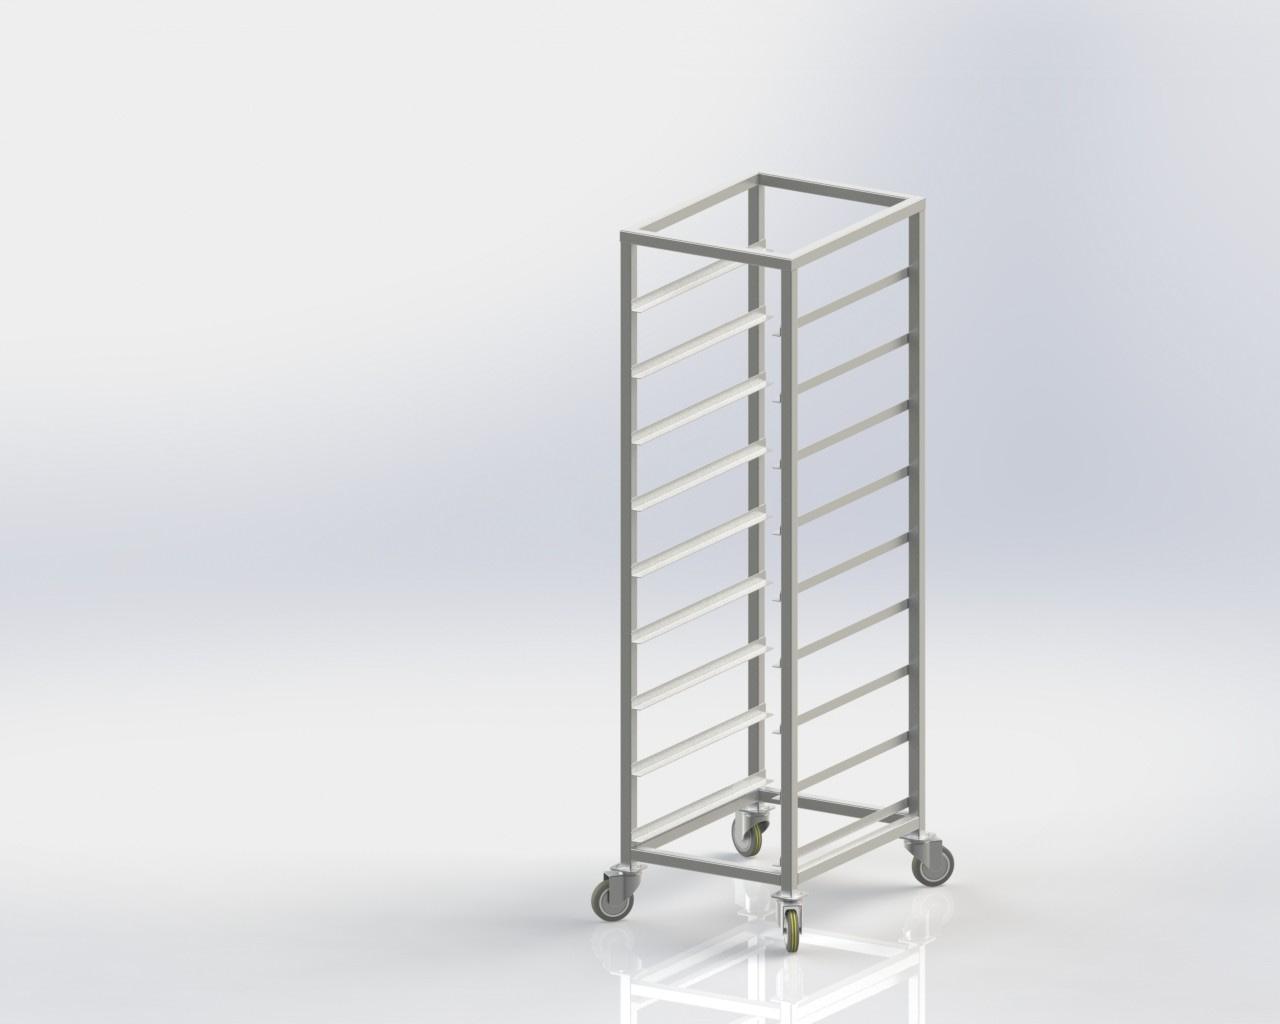 Vegetable Rack Trolley for commercial kitchen